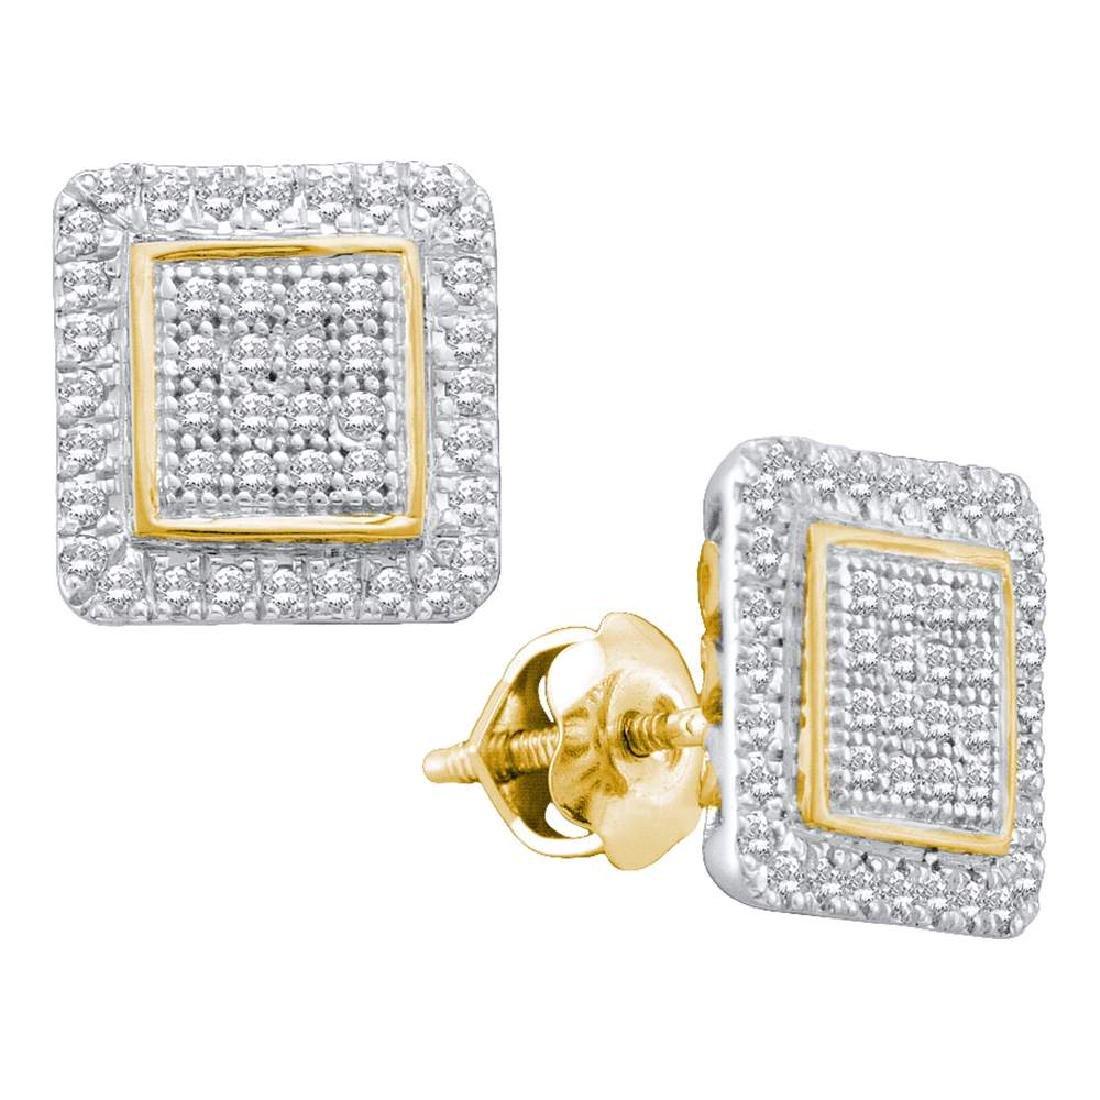 0.31 CTW Diamond Cluster Square Stud Earrings 10KT